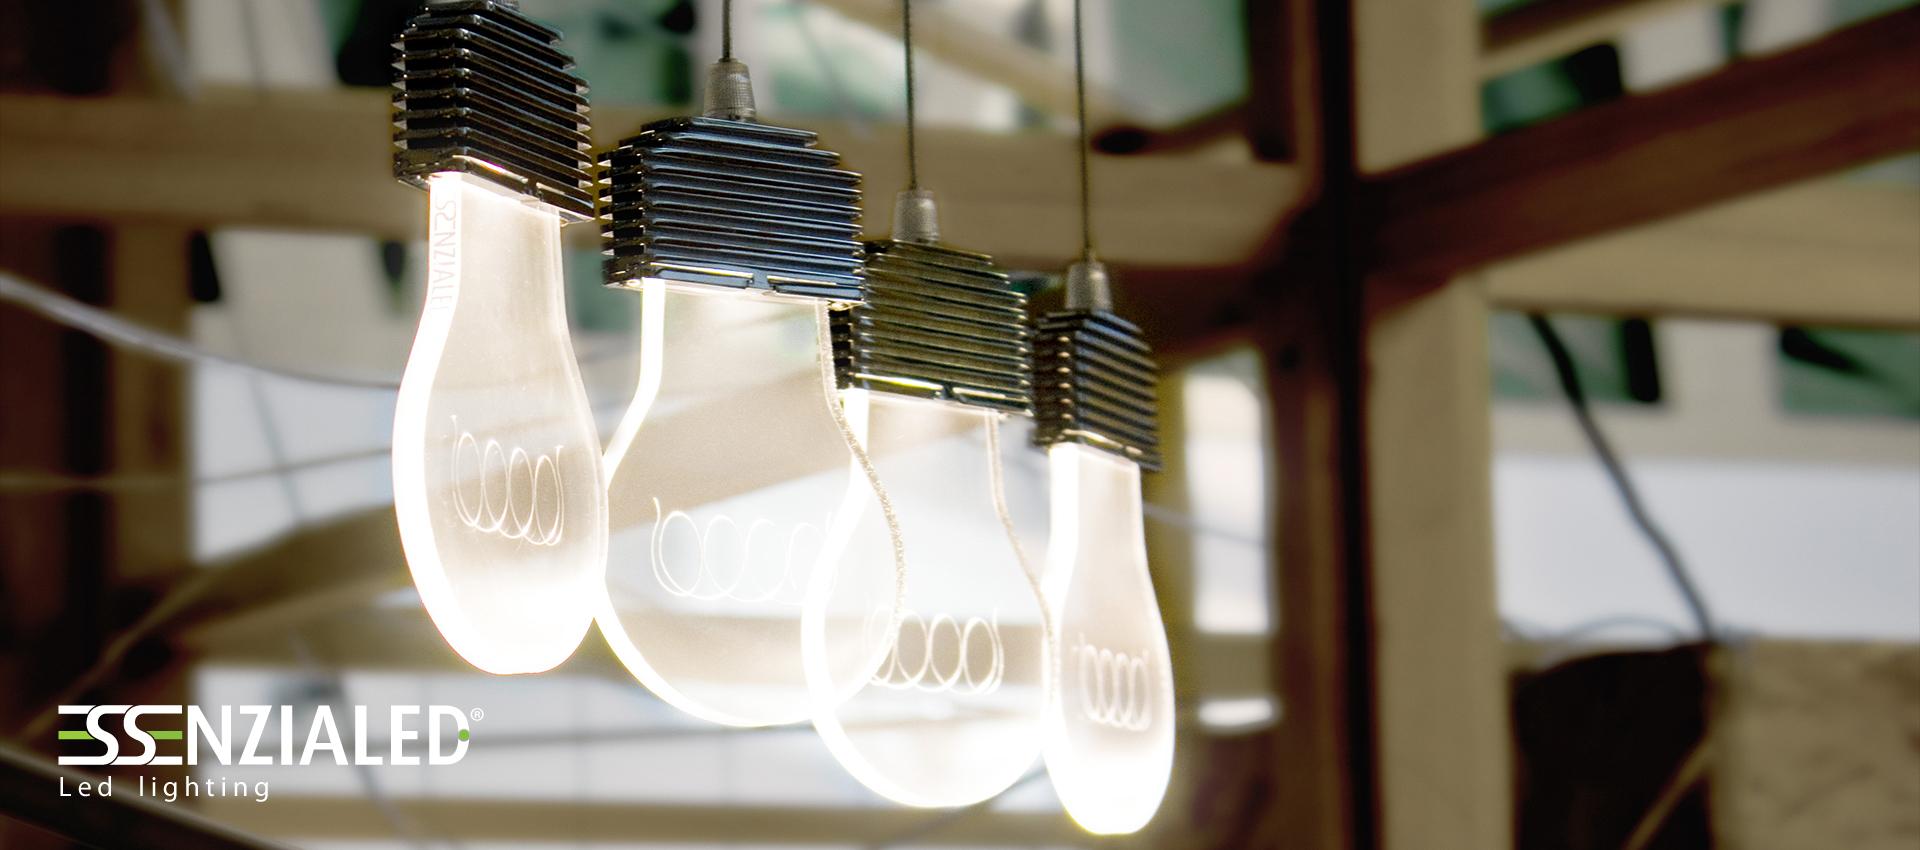 Cara vecchia lampadina sospensione   essenzialed   illuminazione a ...